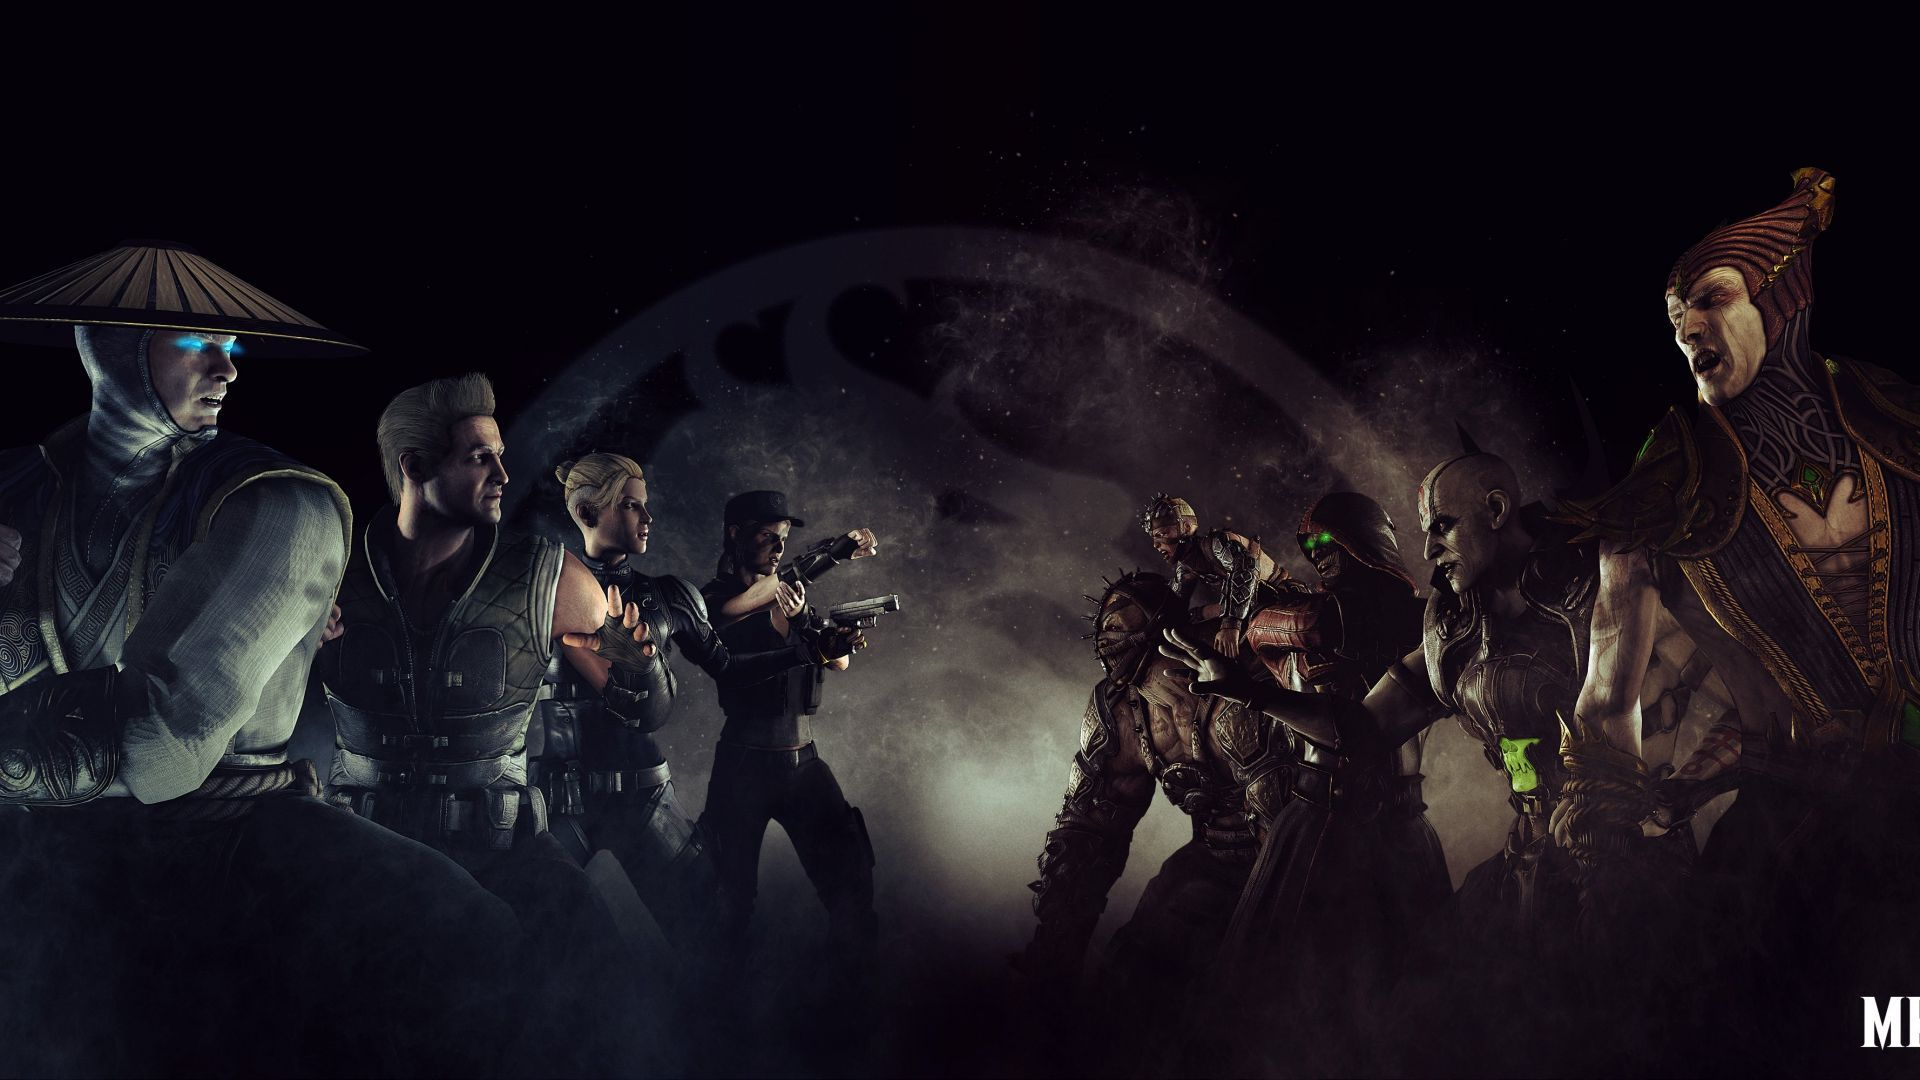 Mortal Kombat X Characters Pc Games Xbox One Ps4 Mortal